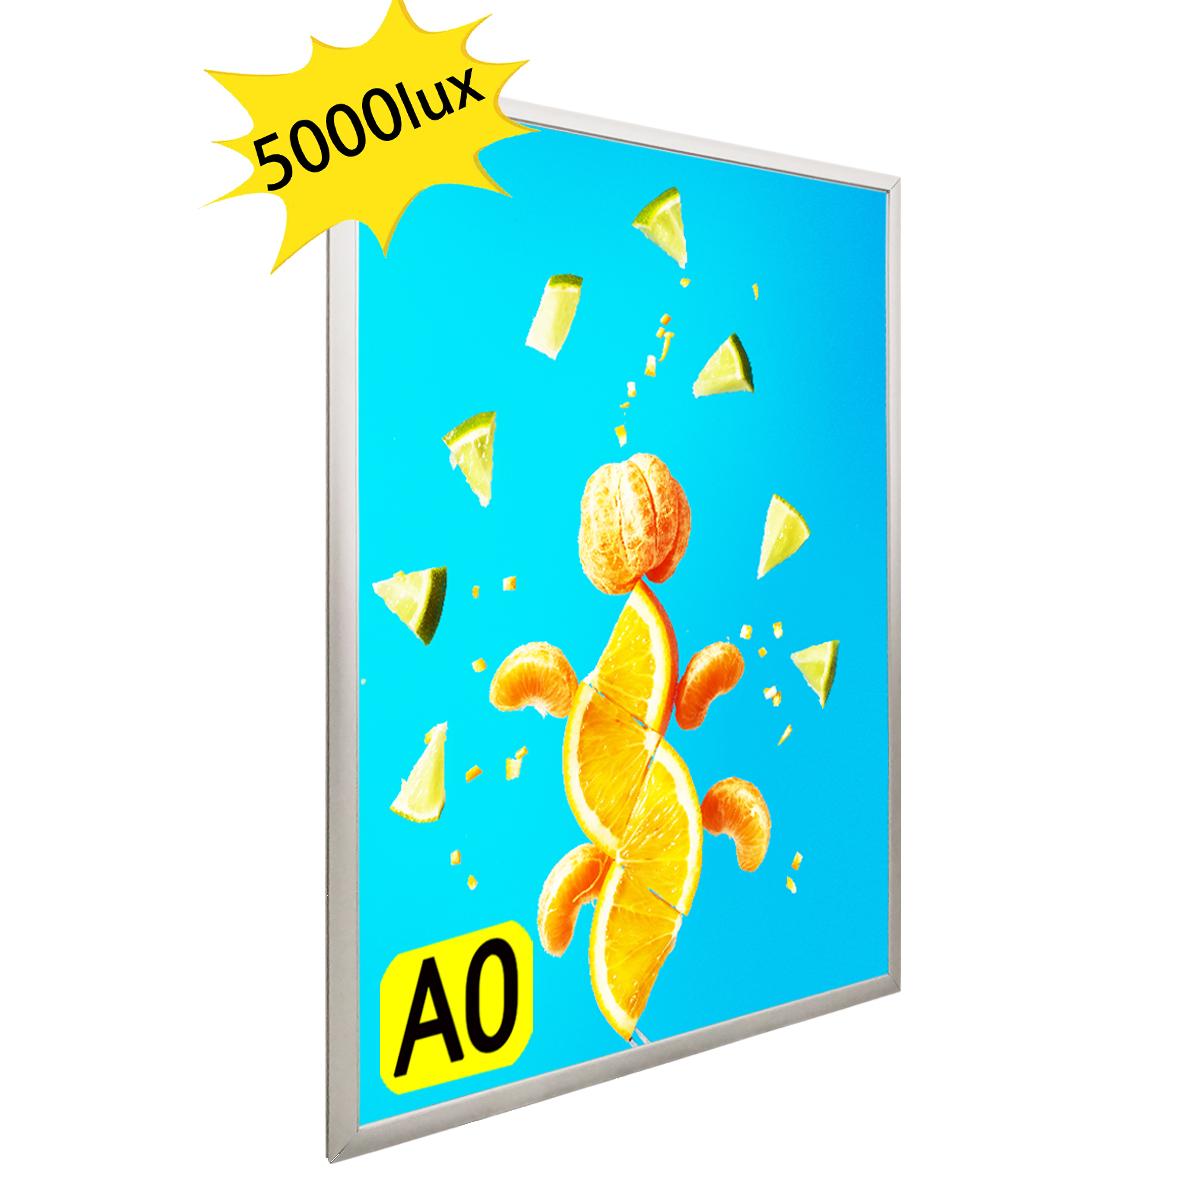 LEDライトパネル 屋内用 店舗用看板 壁掛け看板 四辺開閉式 高輝度 LED看板 シルバー色 A0サイズ OKH20-A0-SV